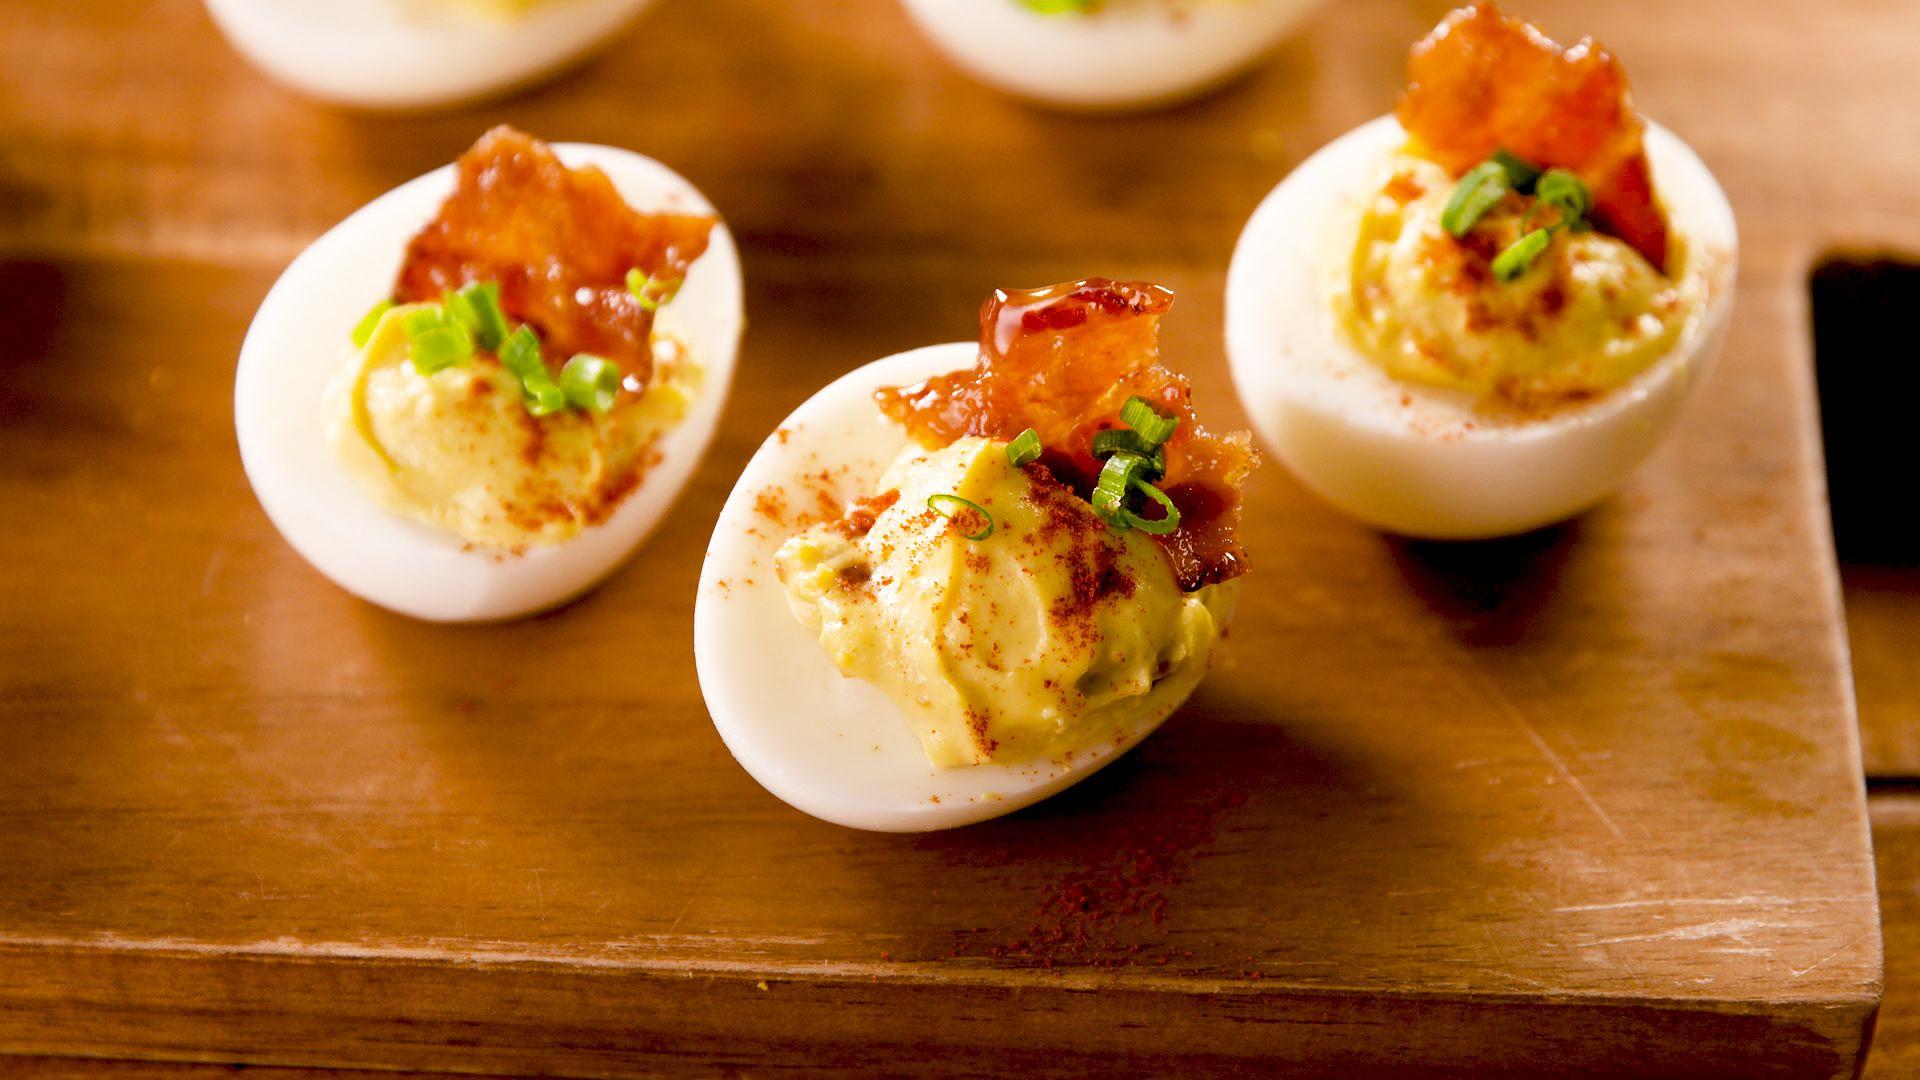 20+ Easy Hard Boiled Eggs Recipes - How To Make Hard Boiled Eggs